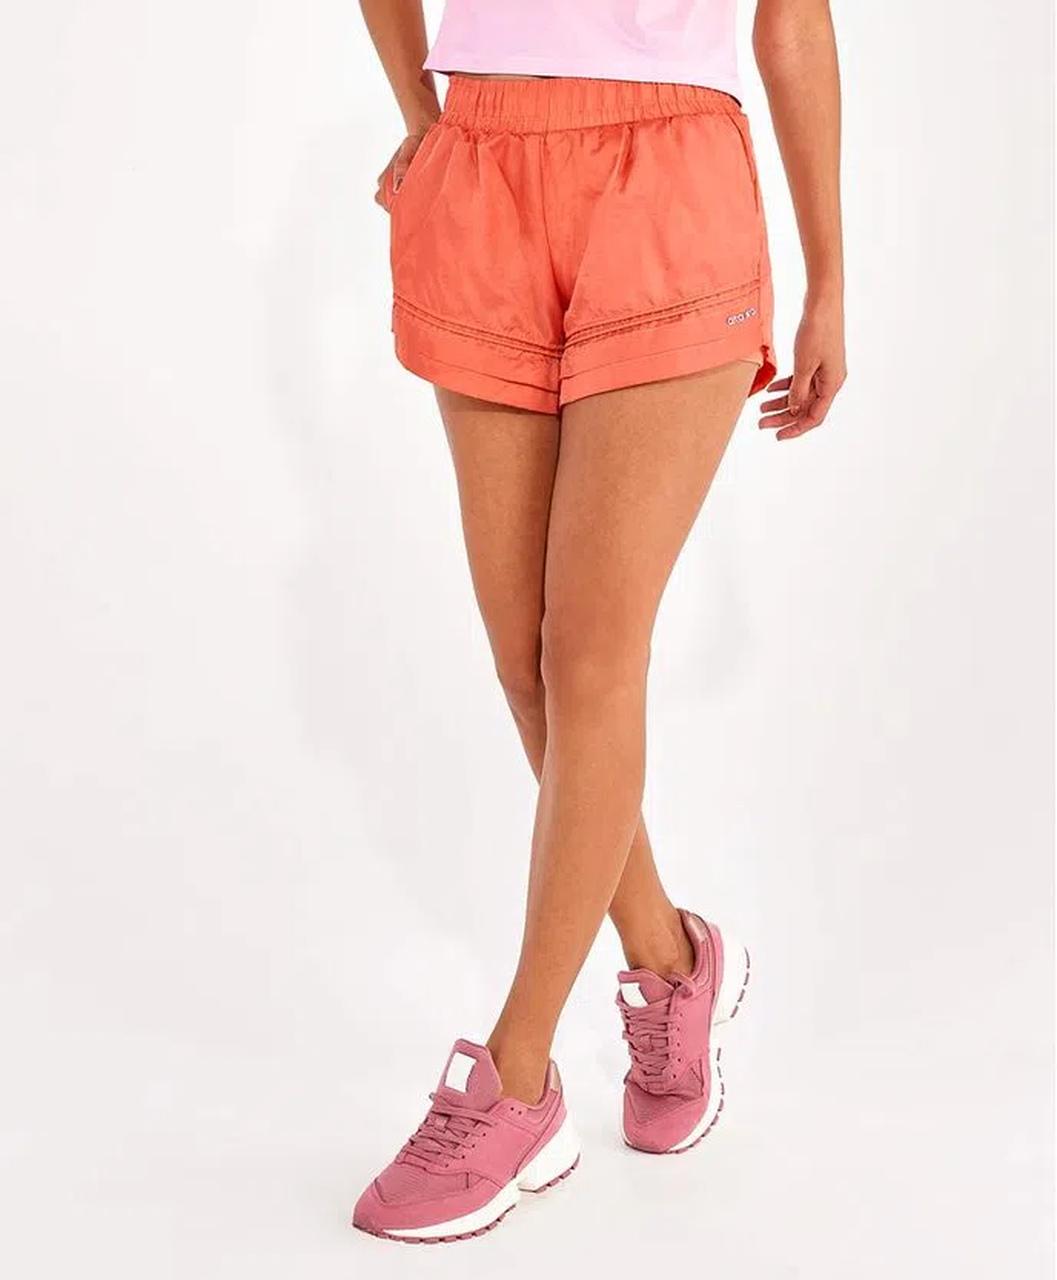 Shorts Feminino Aerofit Barra Dupla Ref:2112031